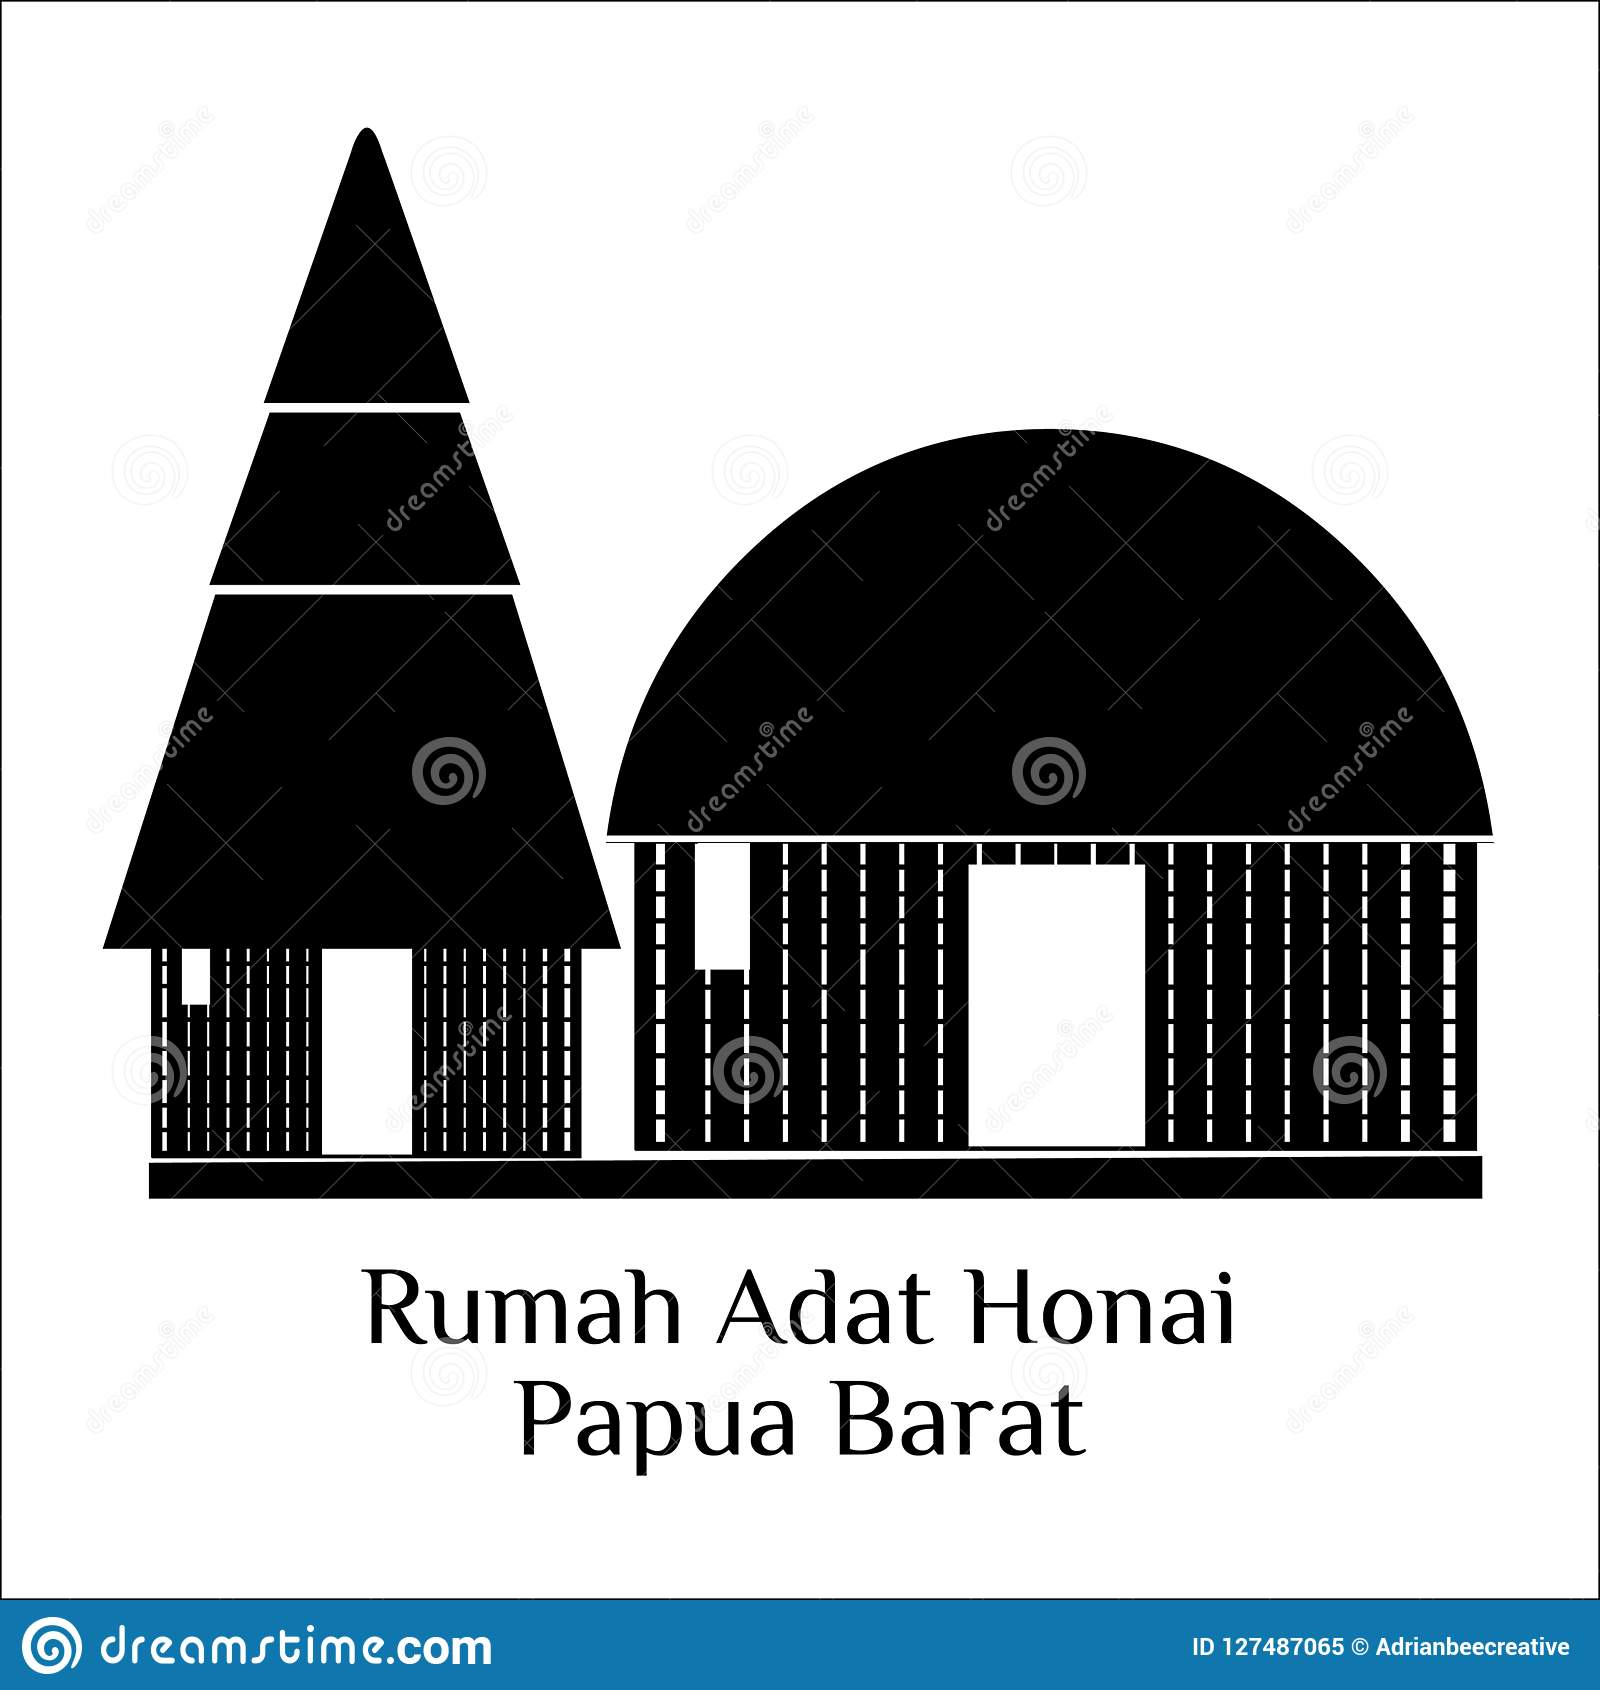 Mewarnai Rumah Adat Honai GAMBAR MEWARNAI HD